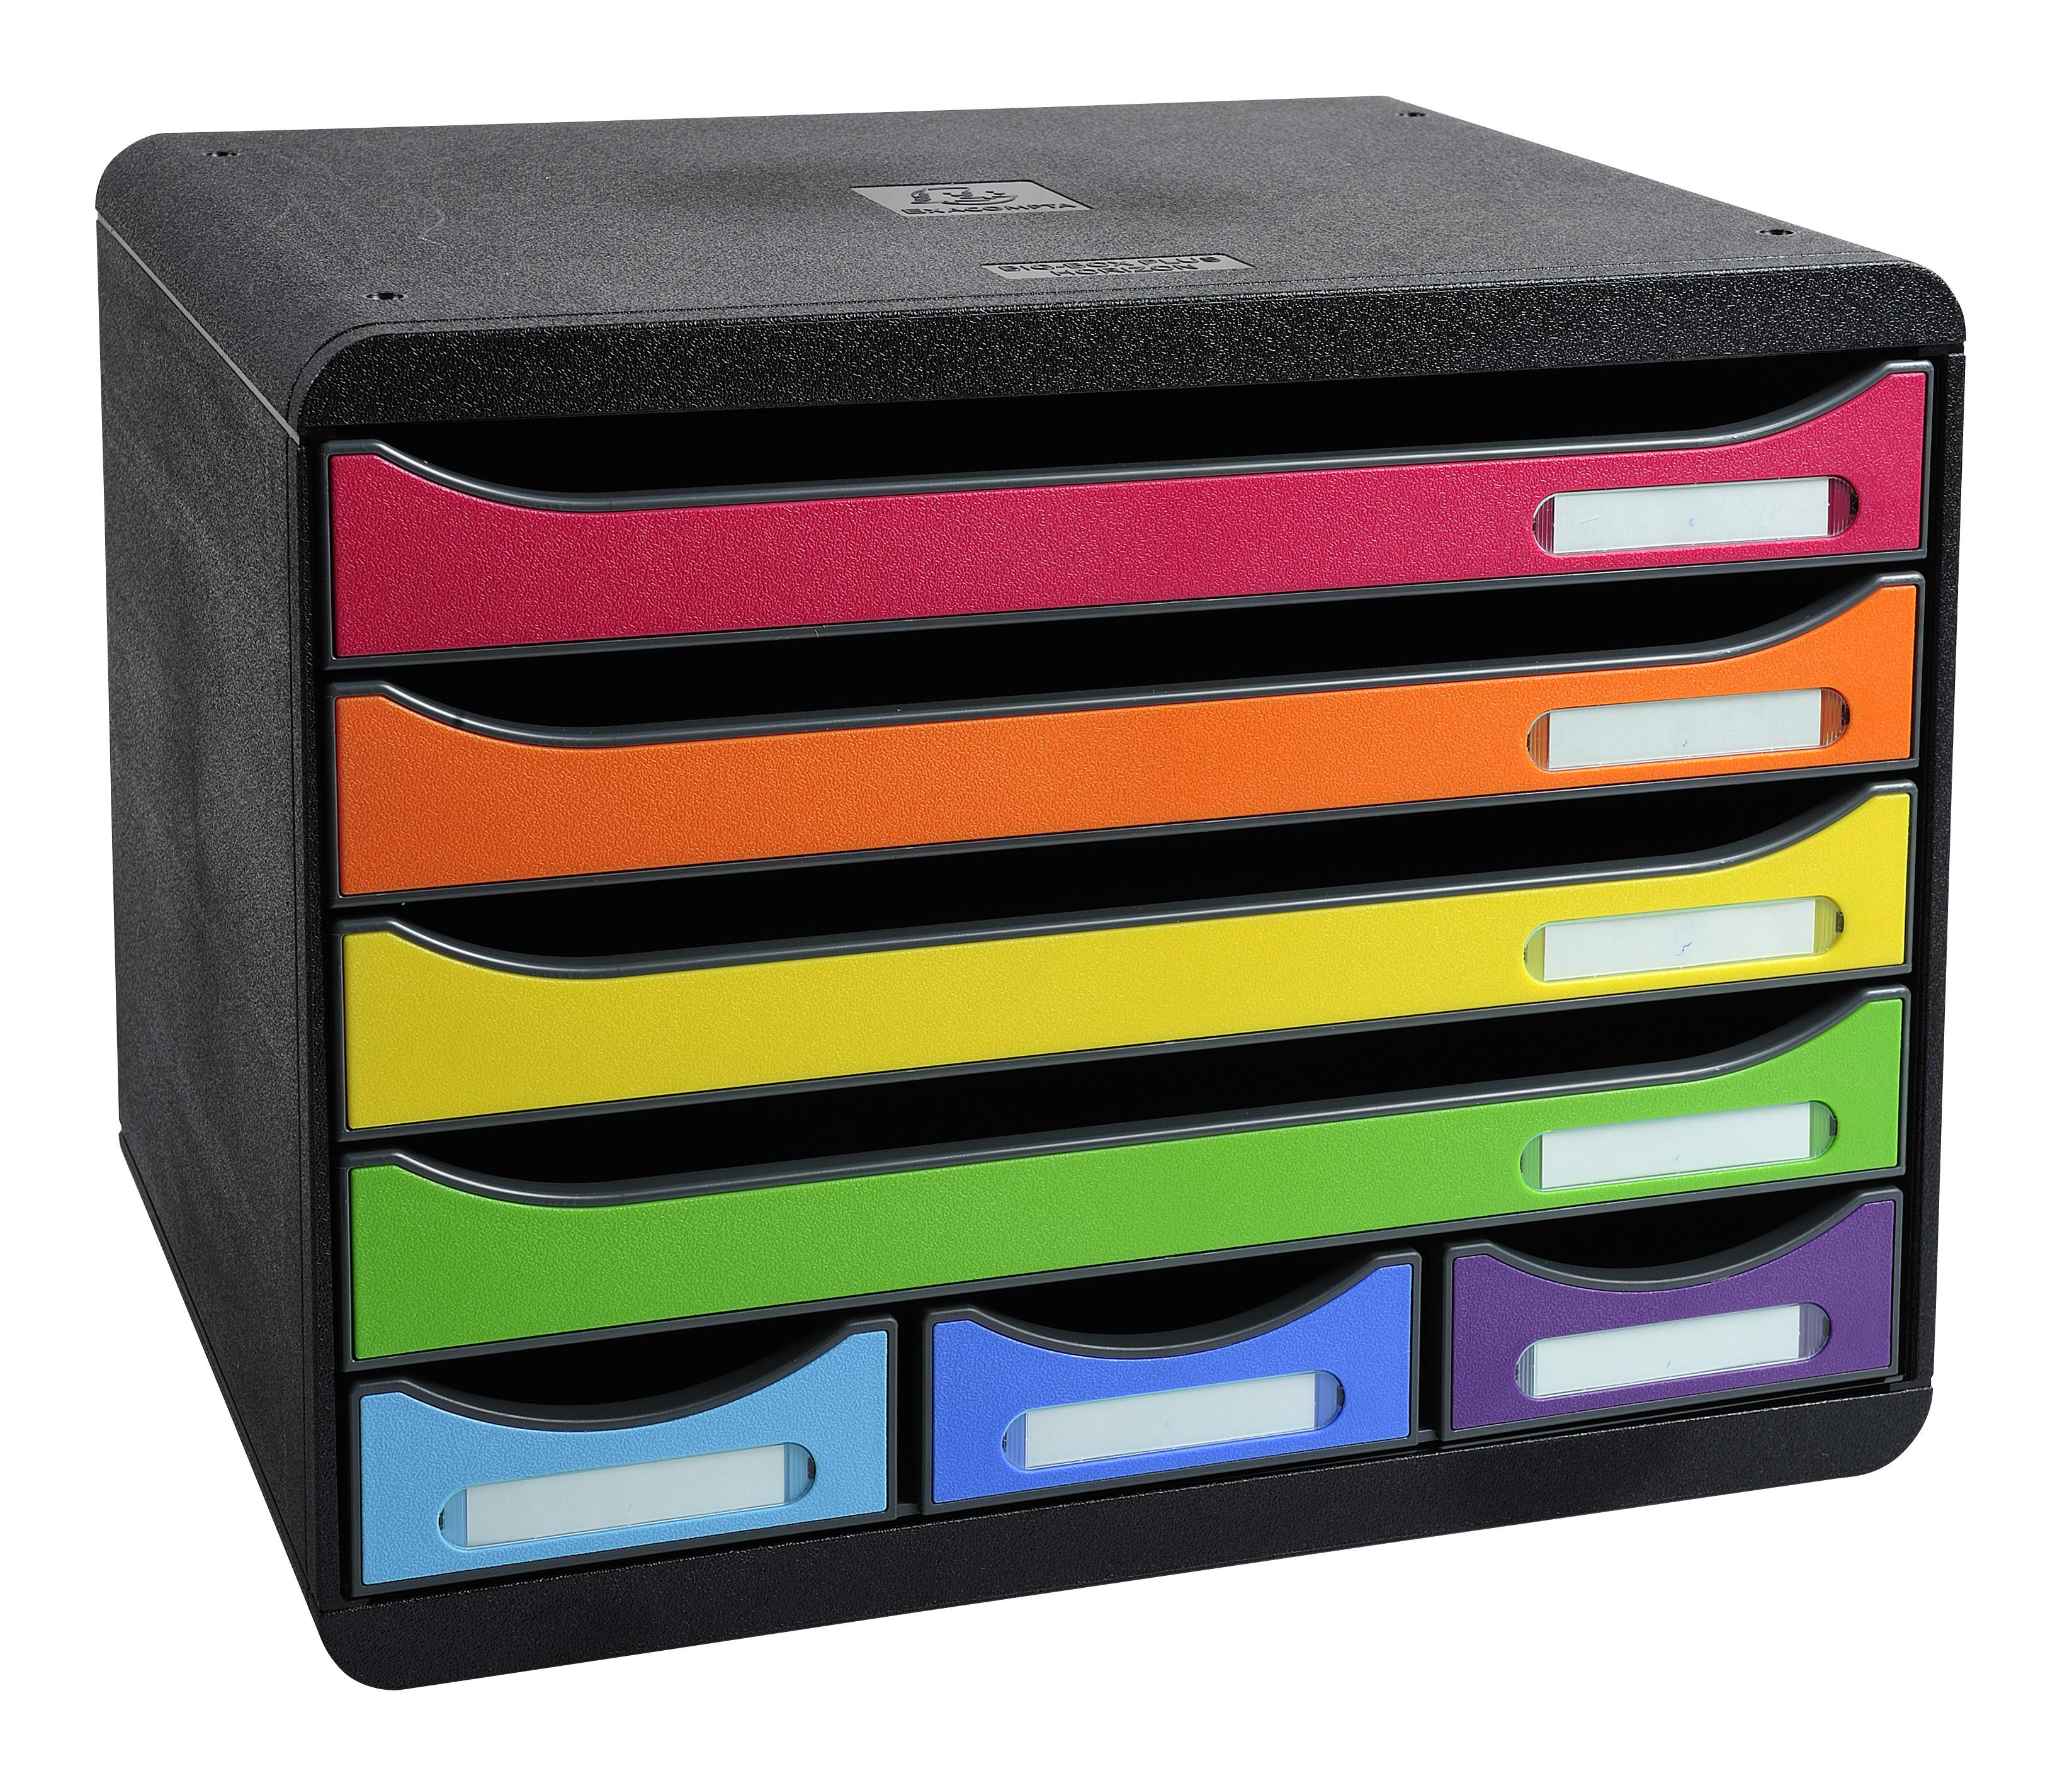 Exa Store Box Mini 7 Drawers HQ